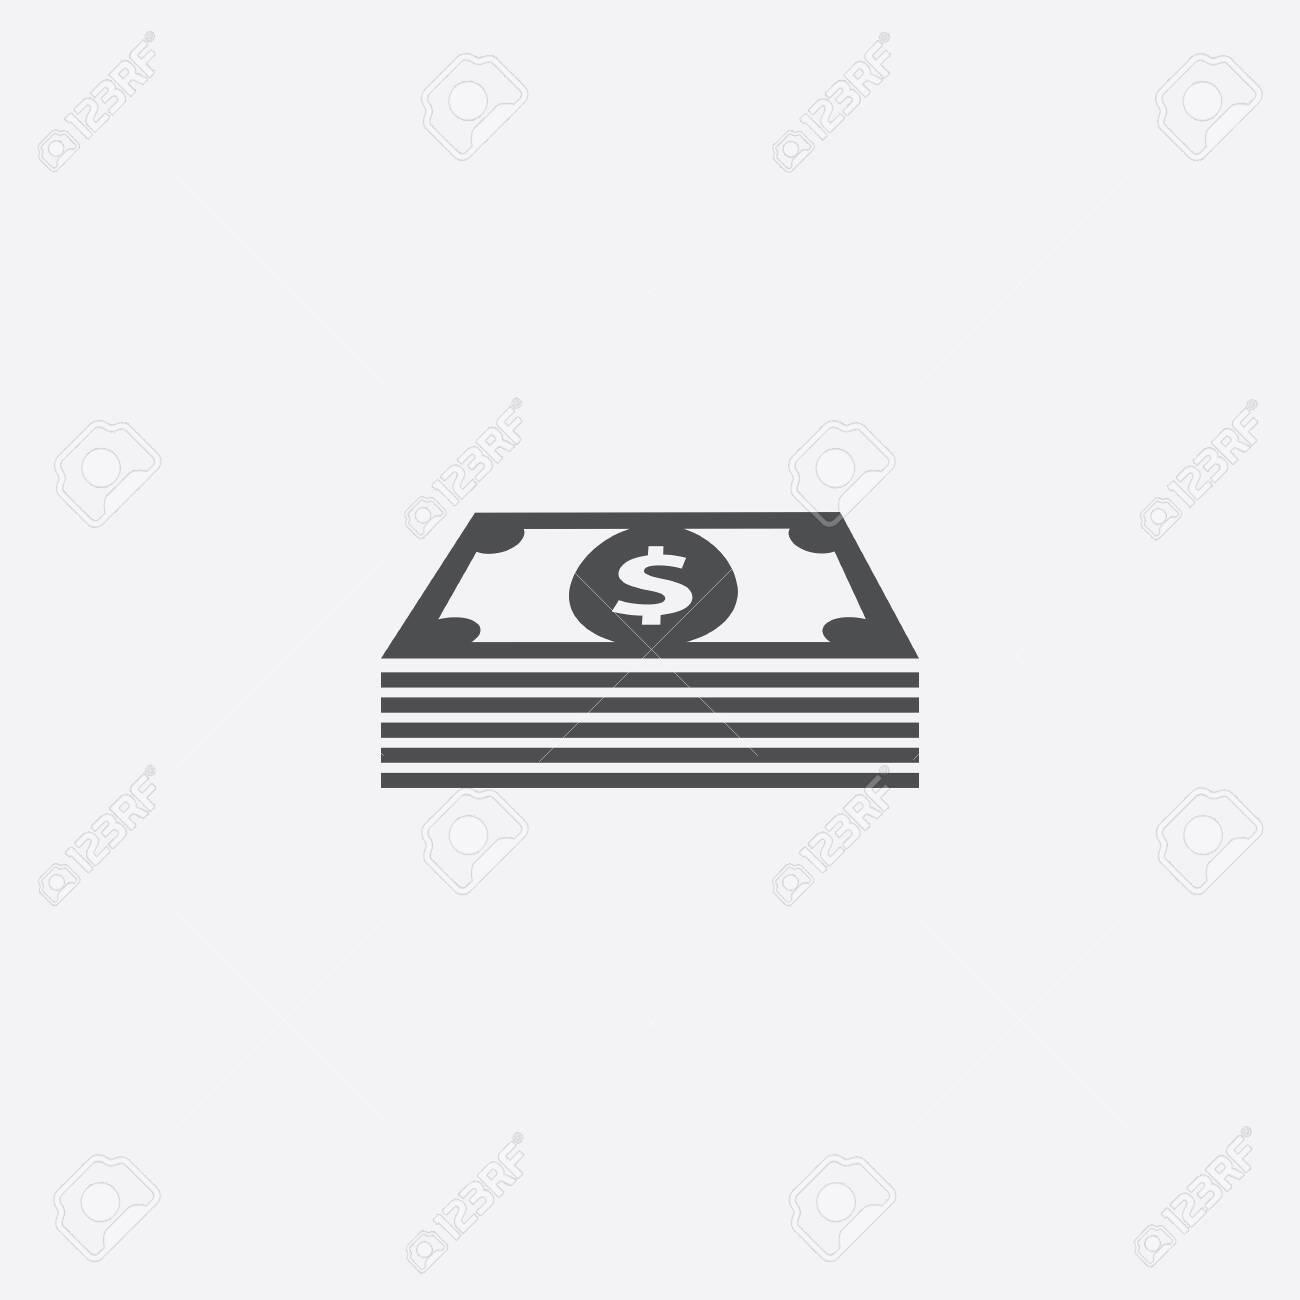 dollar pack icon - 143059671